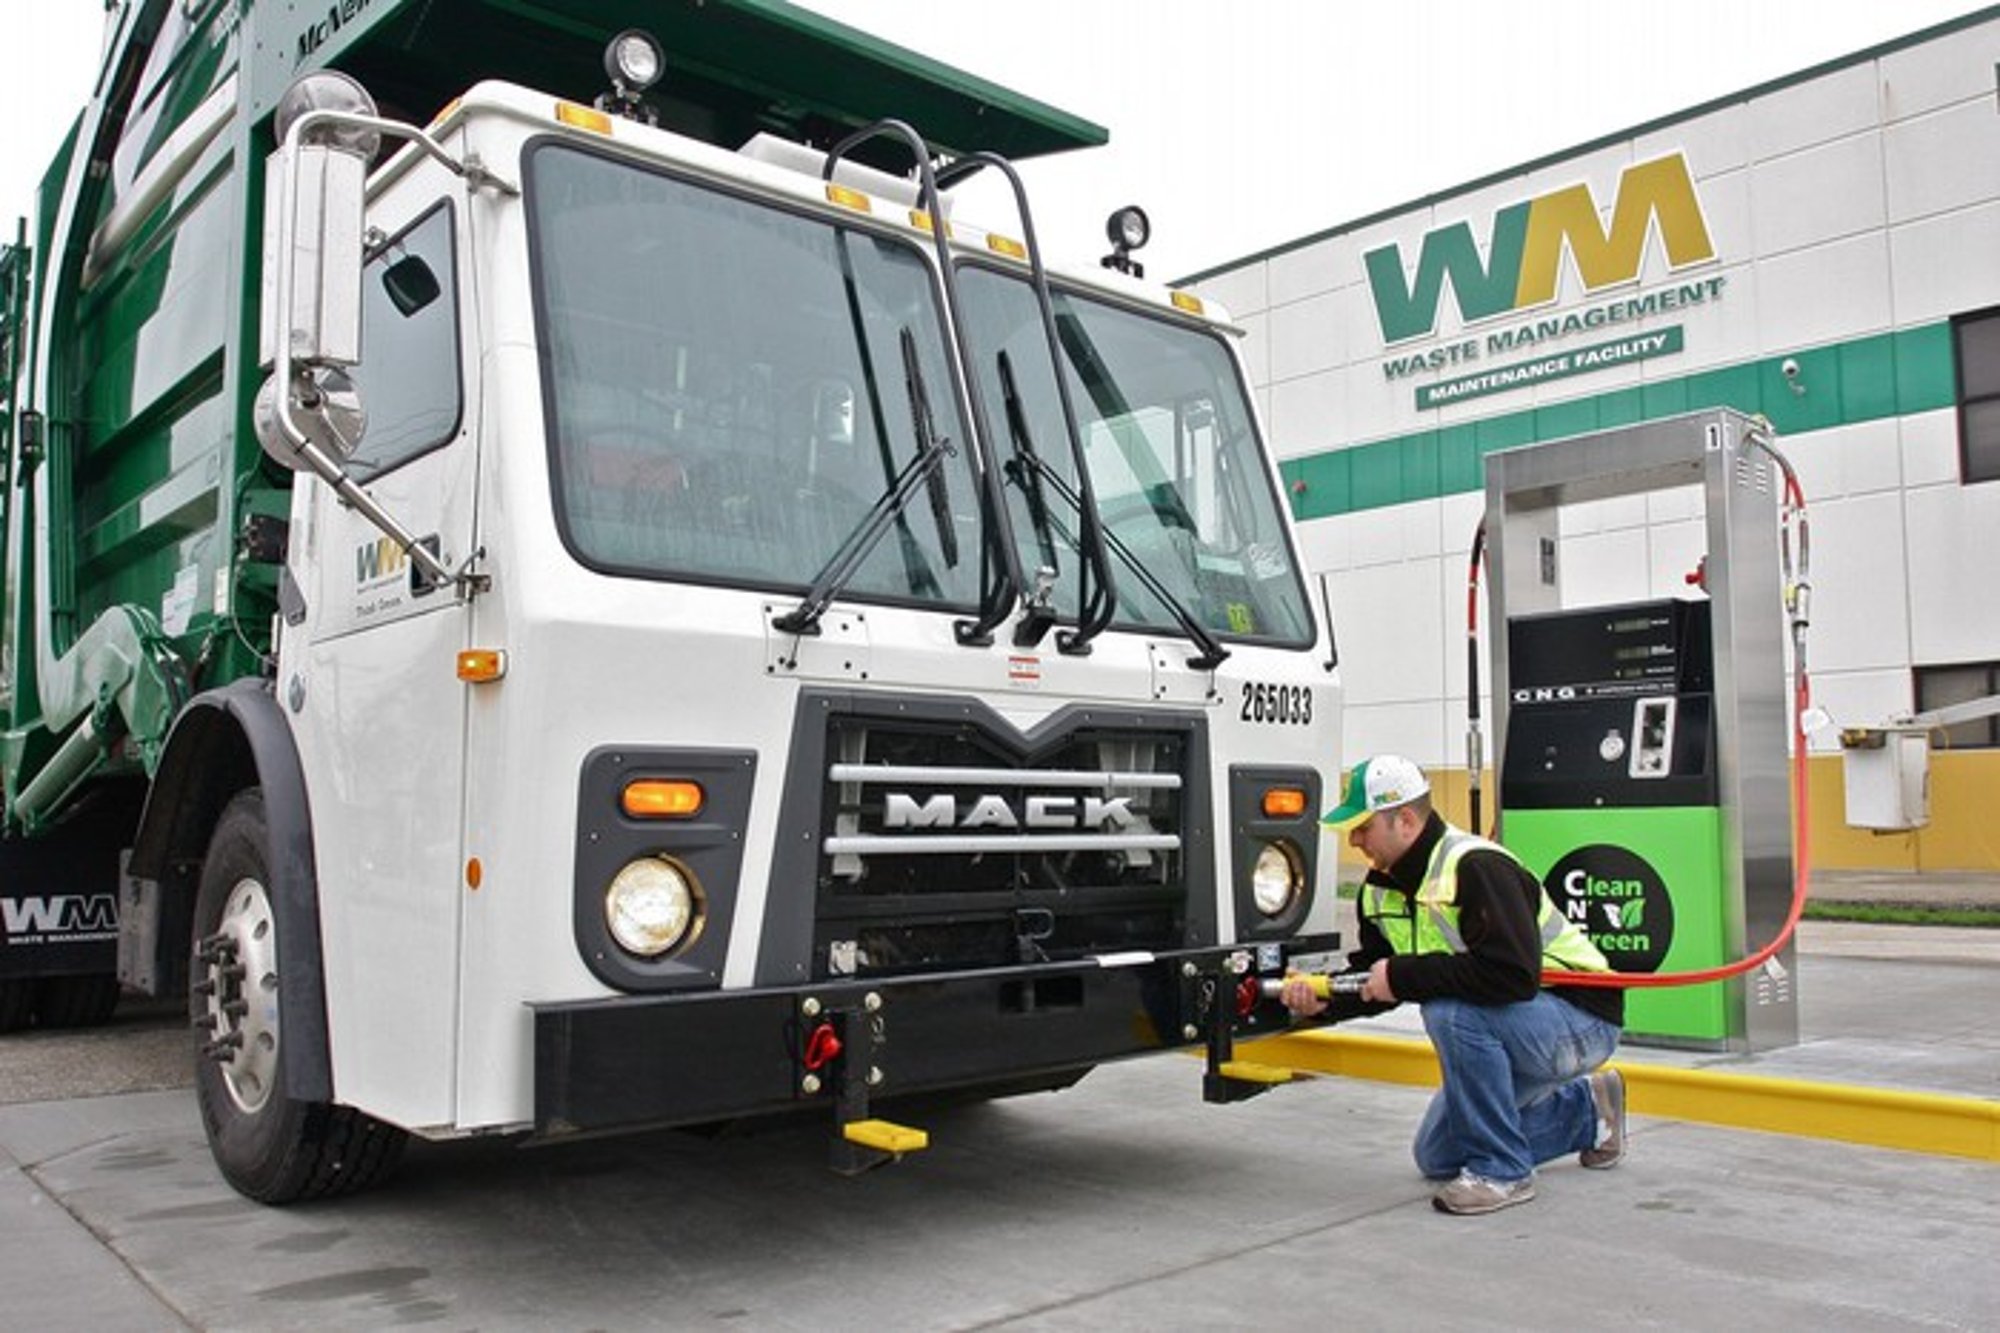 A Waste Management truck